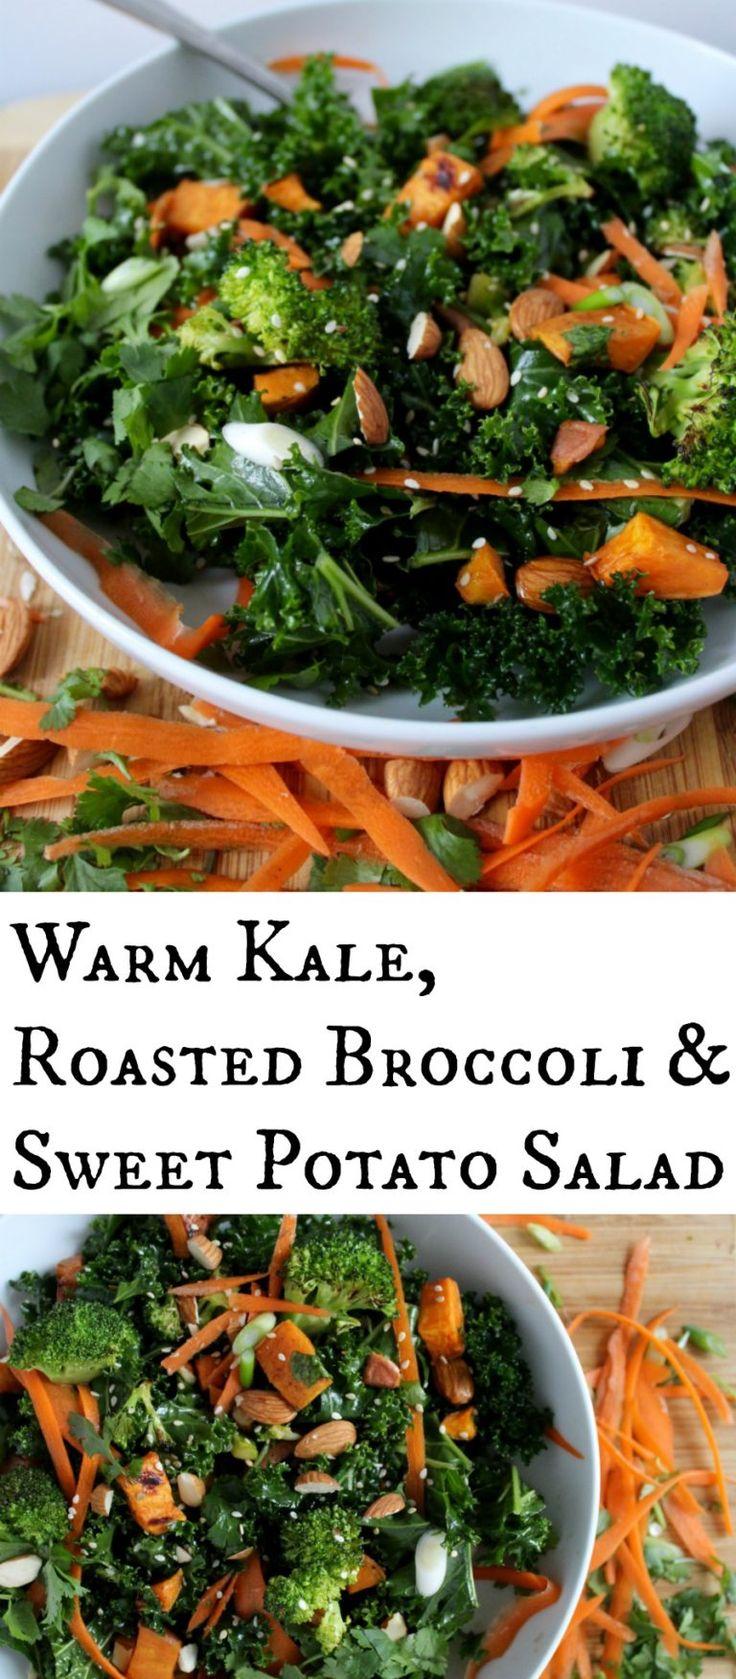 Warm Kale, Roasted Broccoli and Sweet Potato Salad with Sesame ...